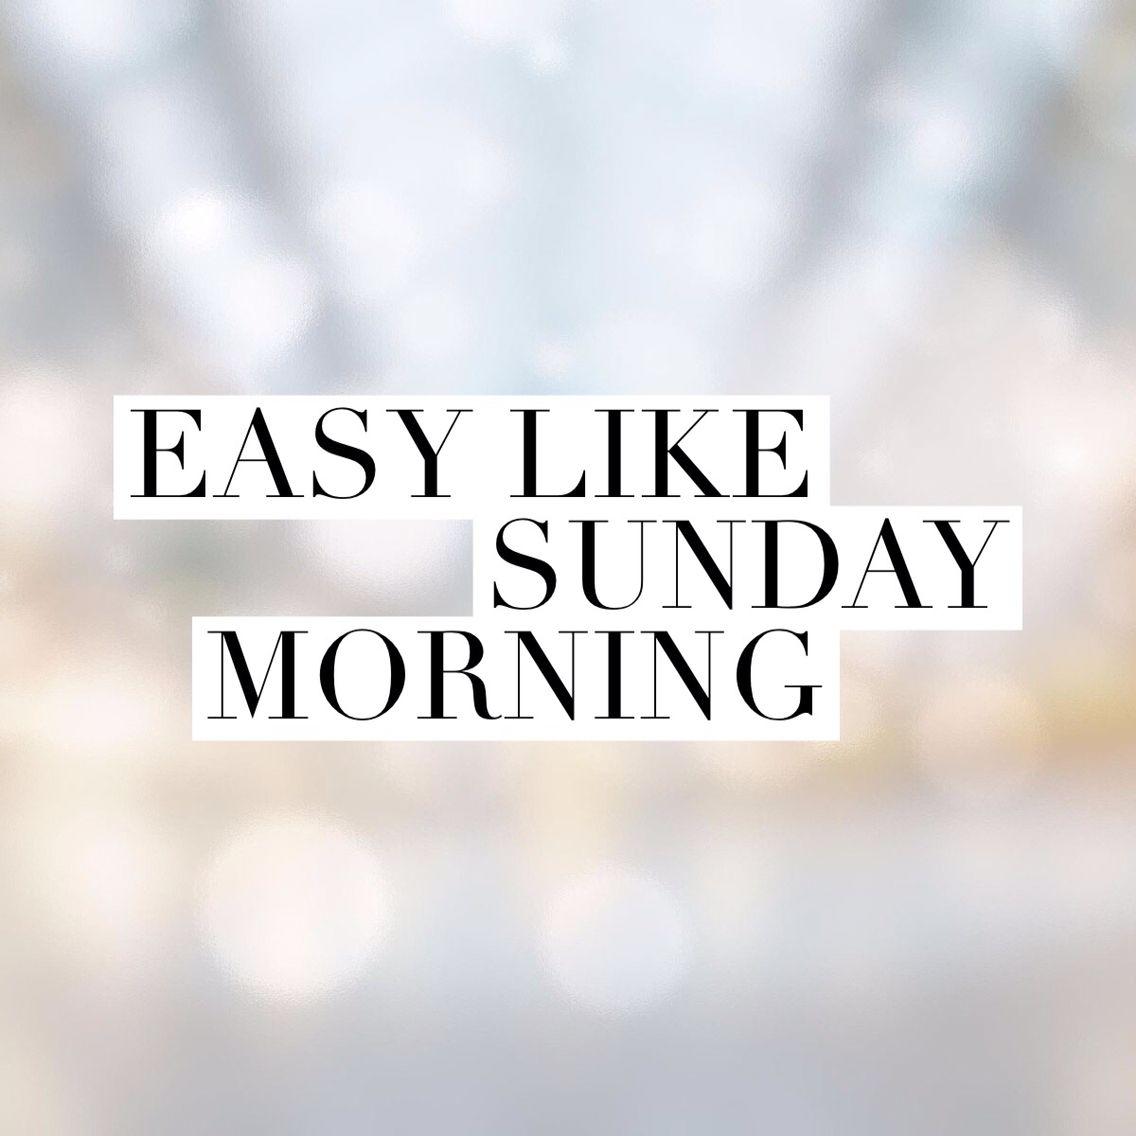 Quotes Morning: Easy Like Sunday Morning